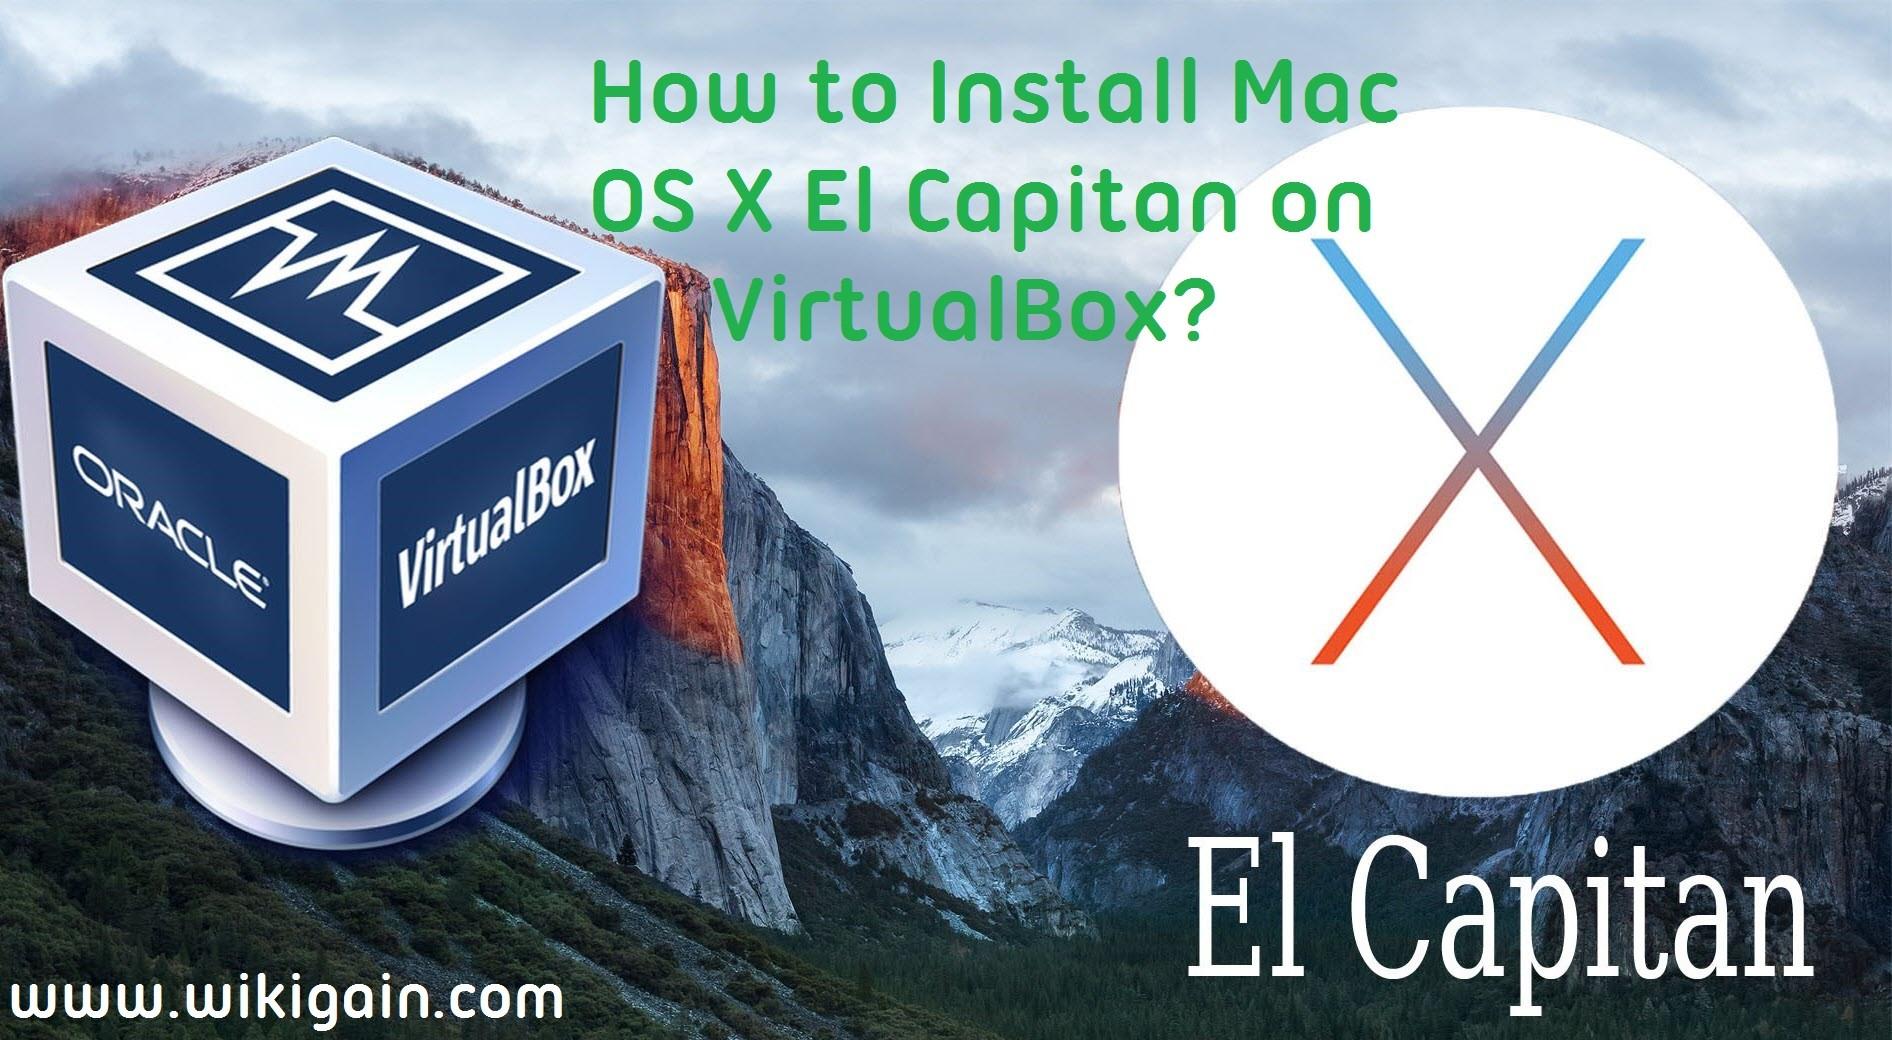 How to Install Mac OS X El Capitan on VirtualBox? - wikigain